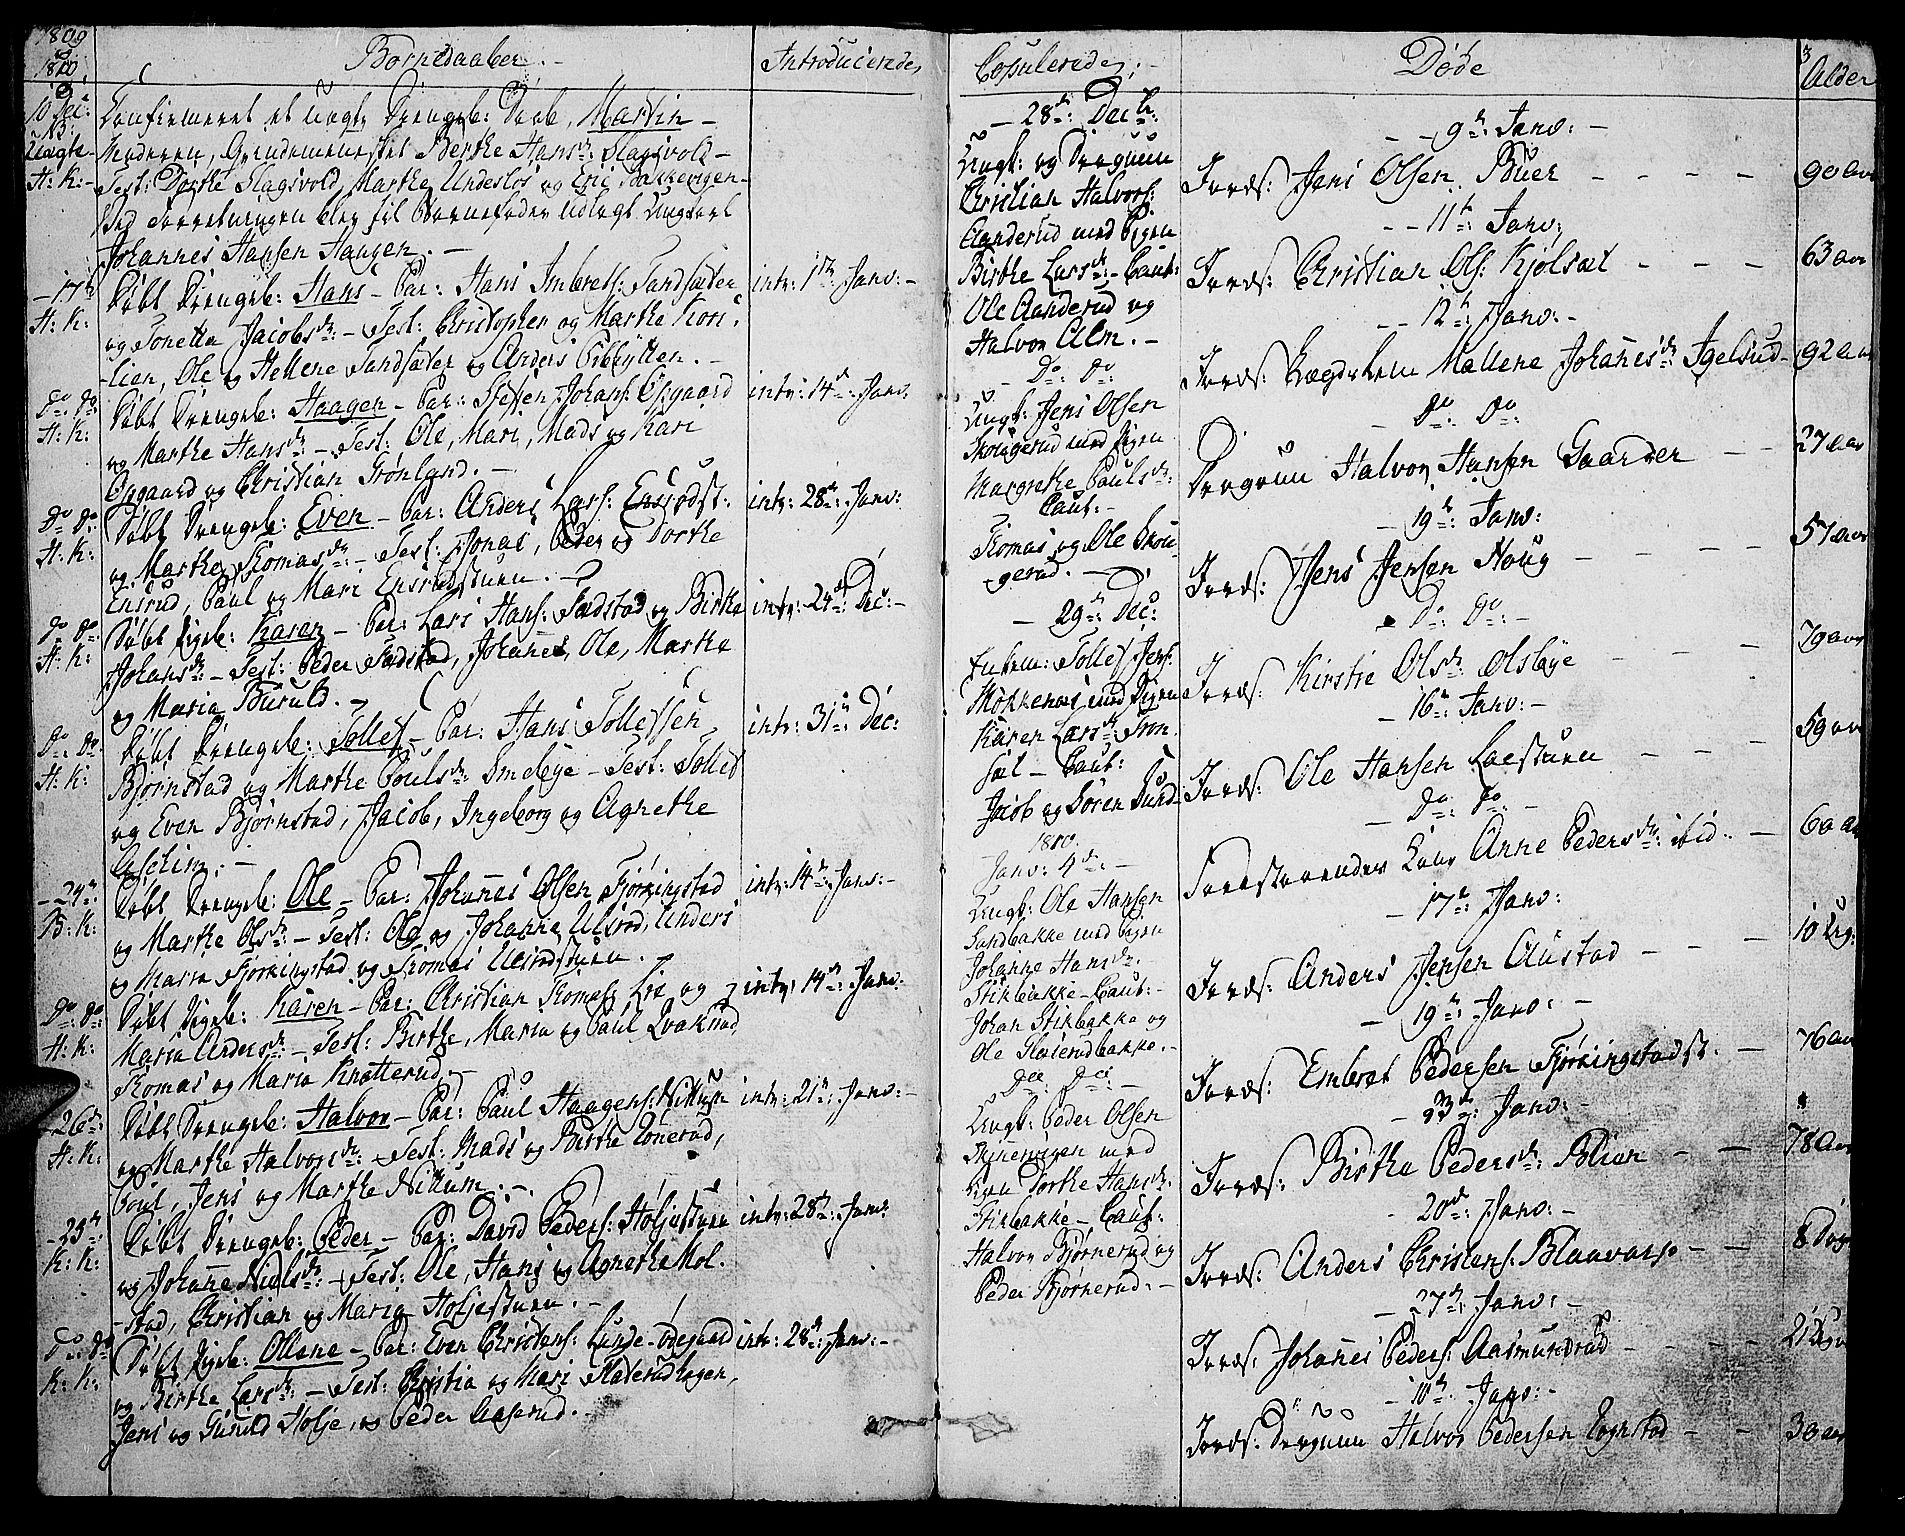 SAH, Toten prestekontor, Ministerialbok nr. 8, 1809-1814, s. 3